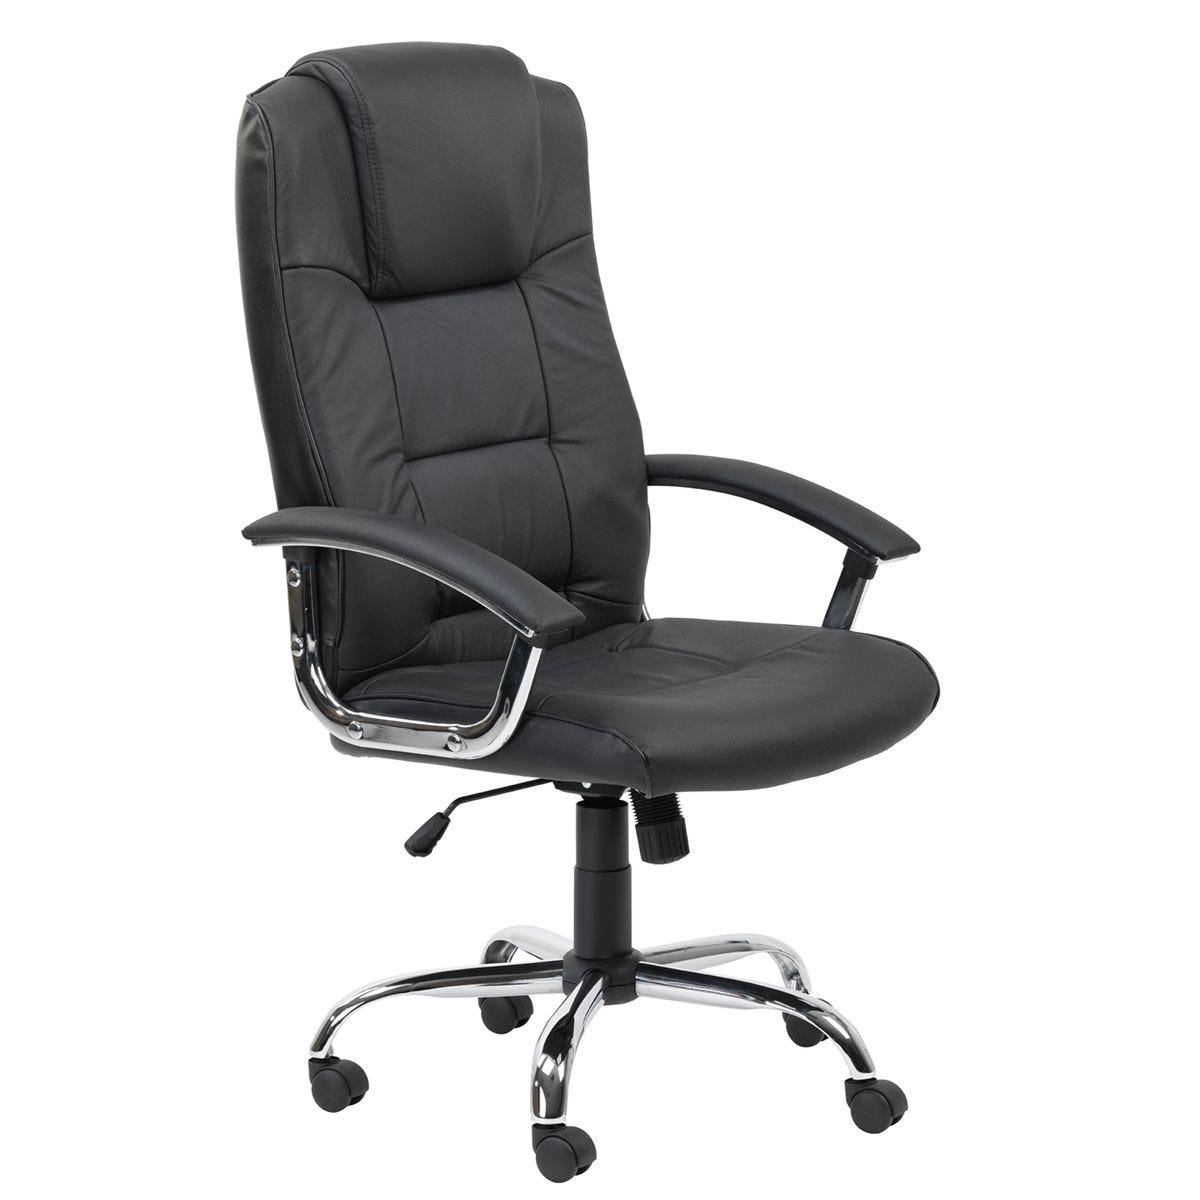 Alphason Houston Leather Office Chair - Black